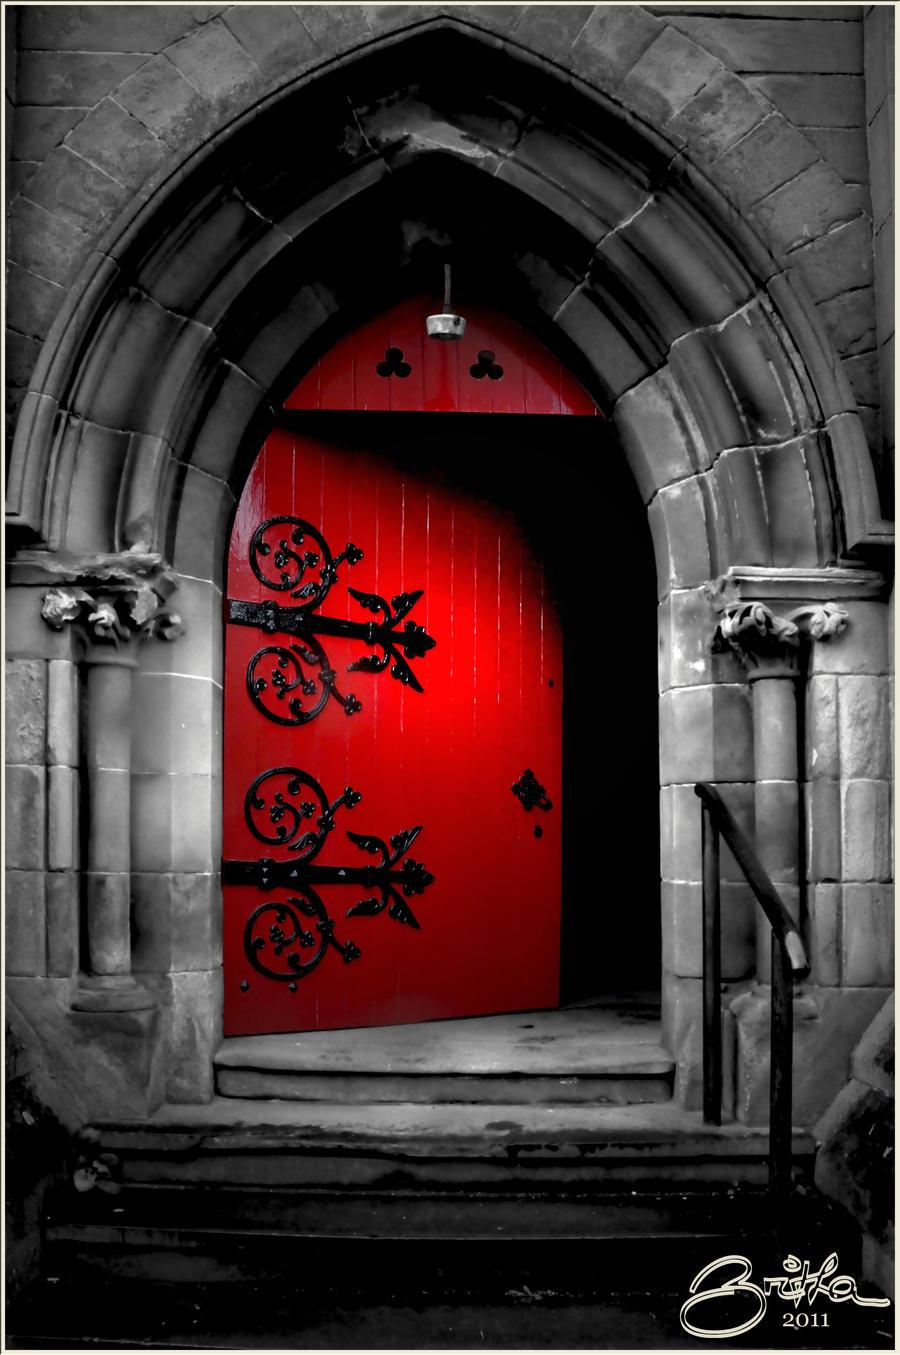 Razbijemo monotoniju bojom - Page 3 The_red_door_by_brijome-d46dzqg